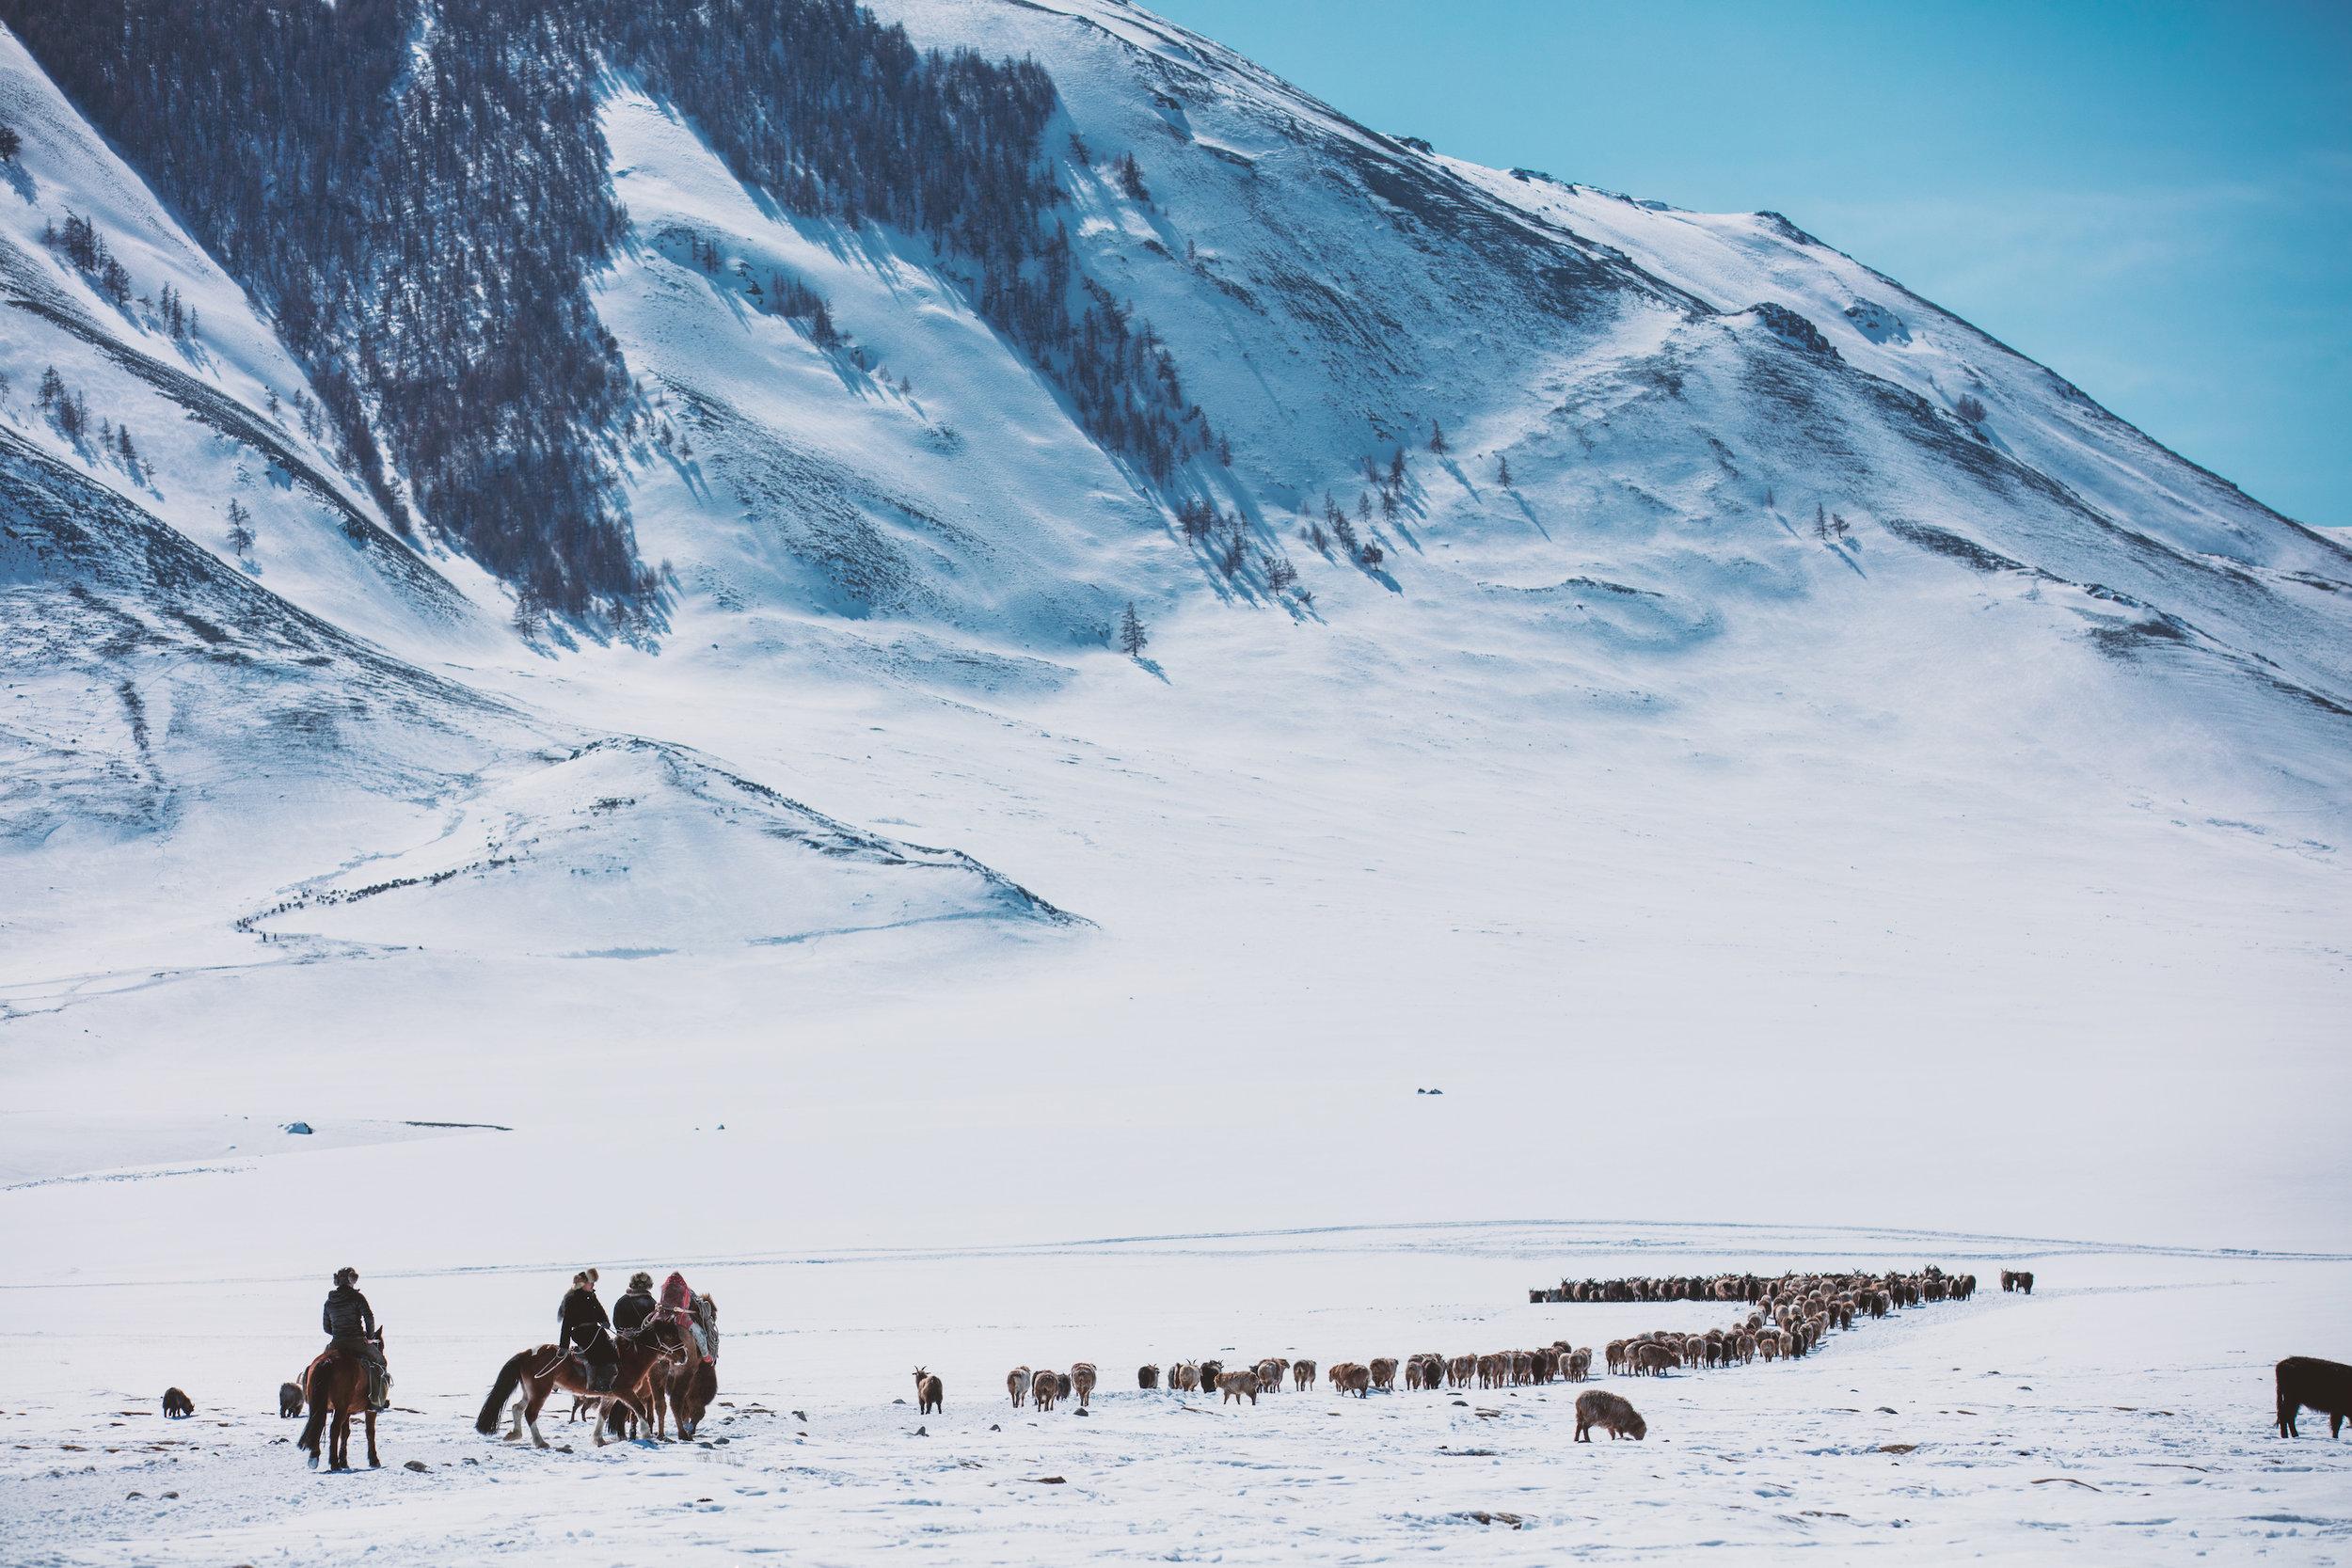 Kazakh nomads on the winter migration,Altai Mountains, Western Mongolia_Boy_Nomad_aAron_Munson.jpg